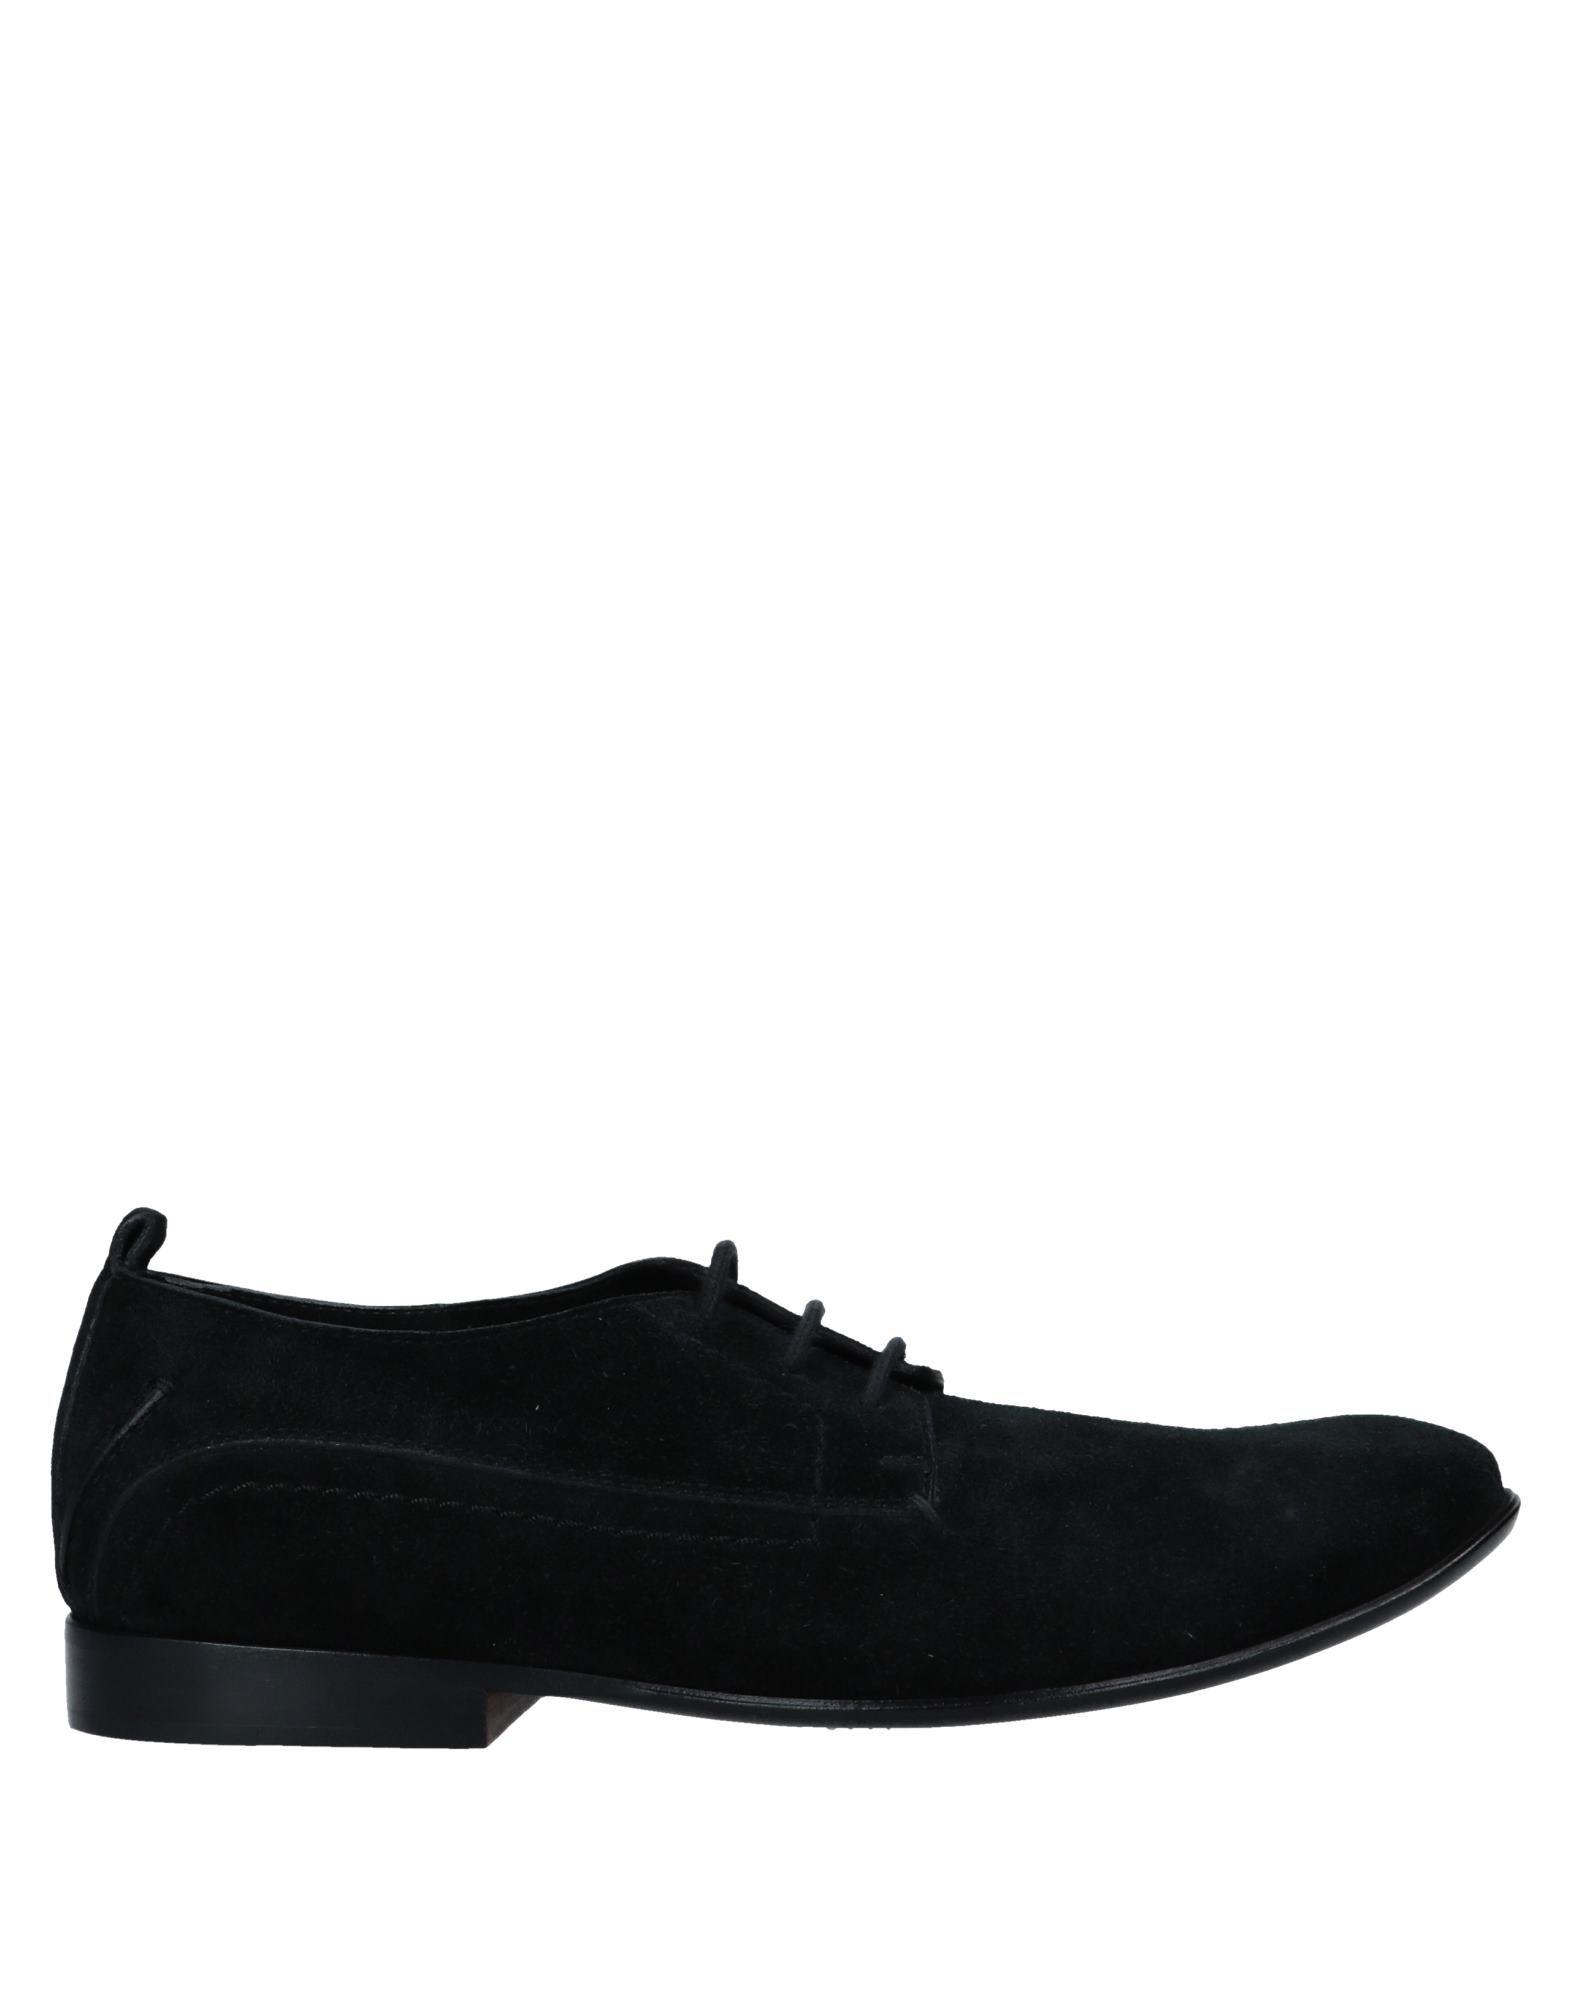 COSTUME NATIONAL HOMME Обувь на шнурках dior homme обувь на шнурках